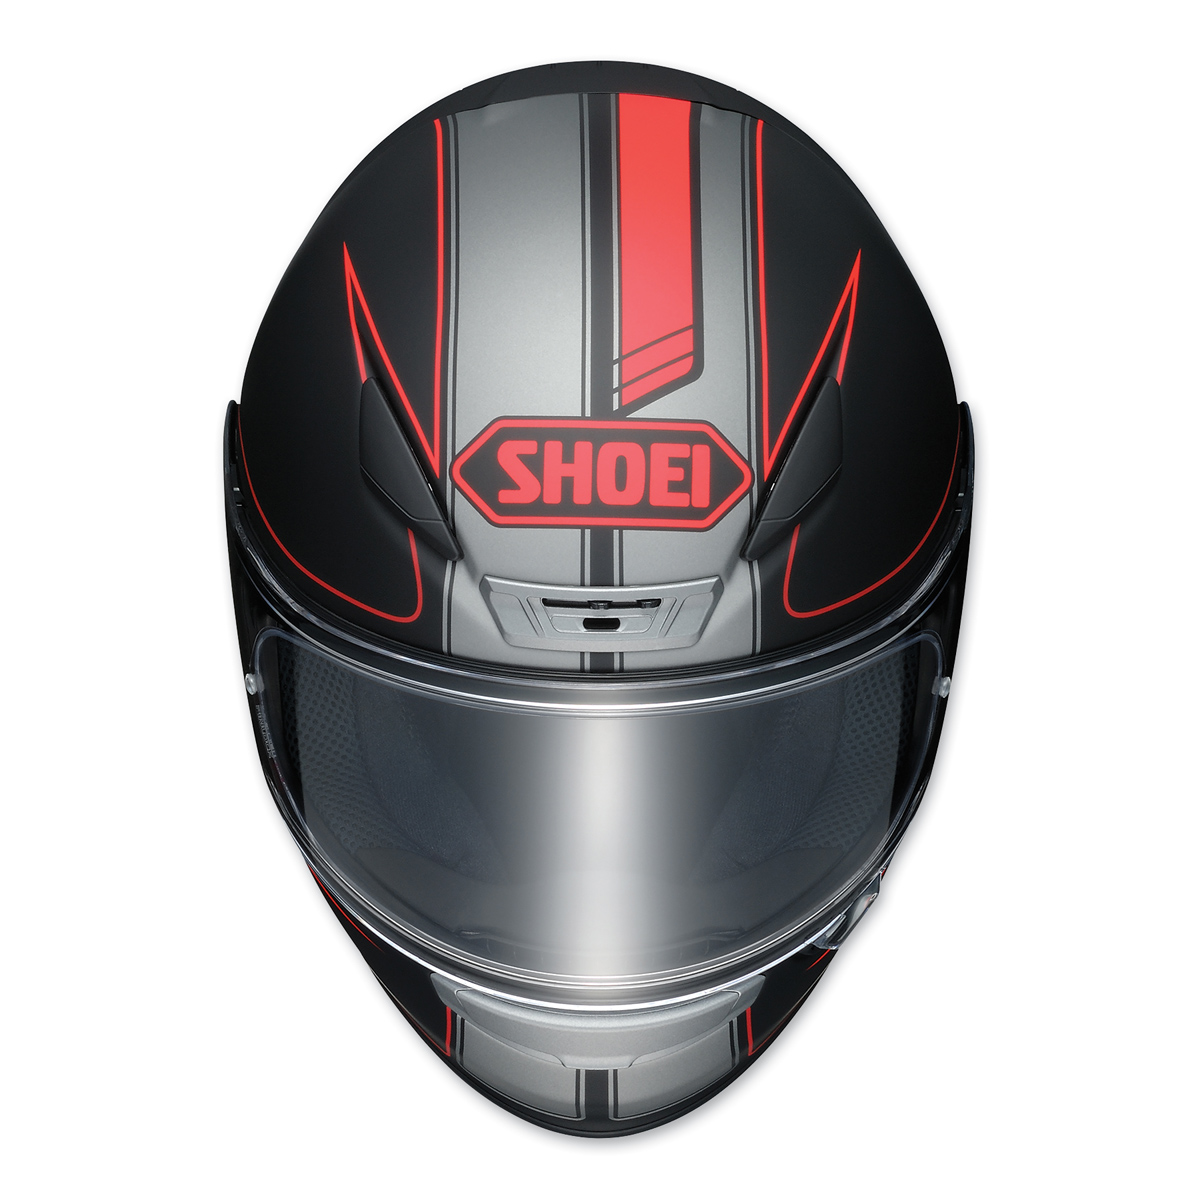 shoei rf 1200 flagger black red full face helmet 834 714. Black Bedroom Furniture Sets. Home Design Ideas